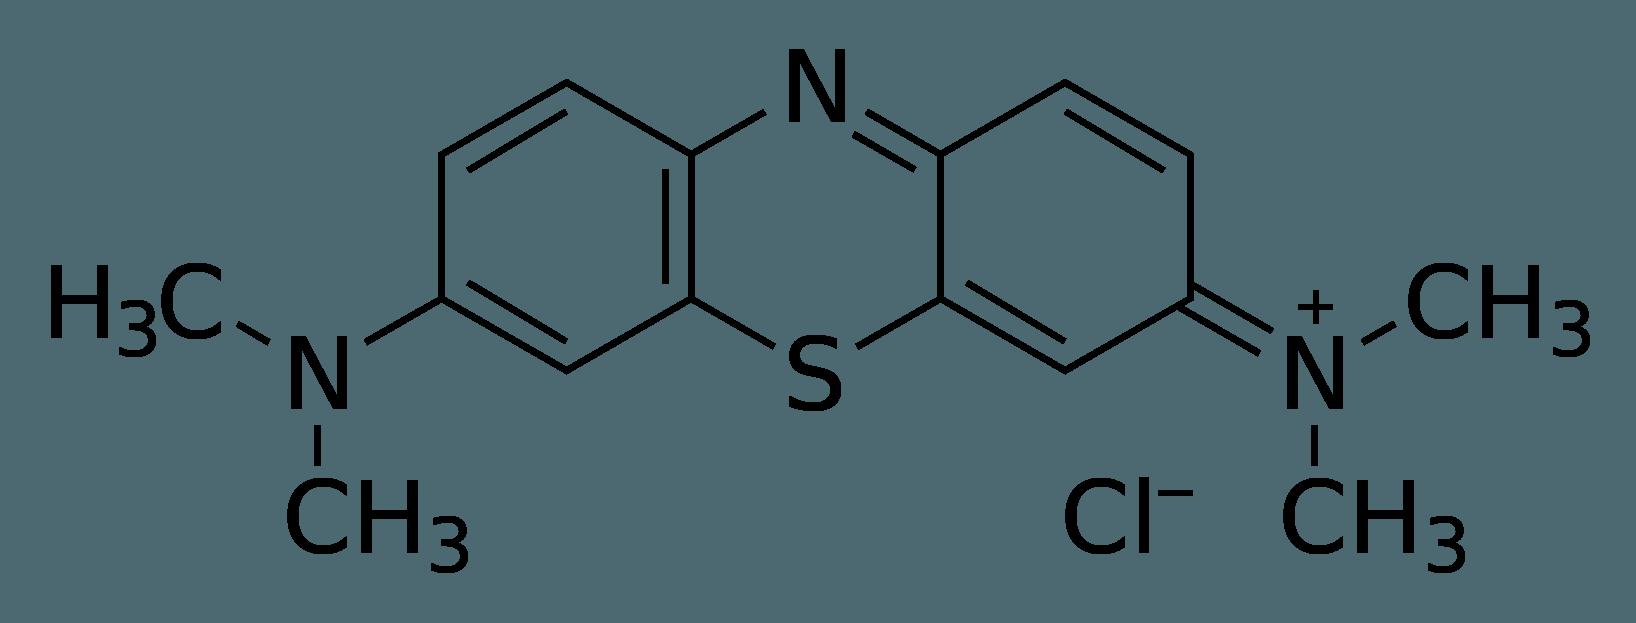 Нейромолекулы: аминазин